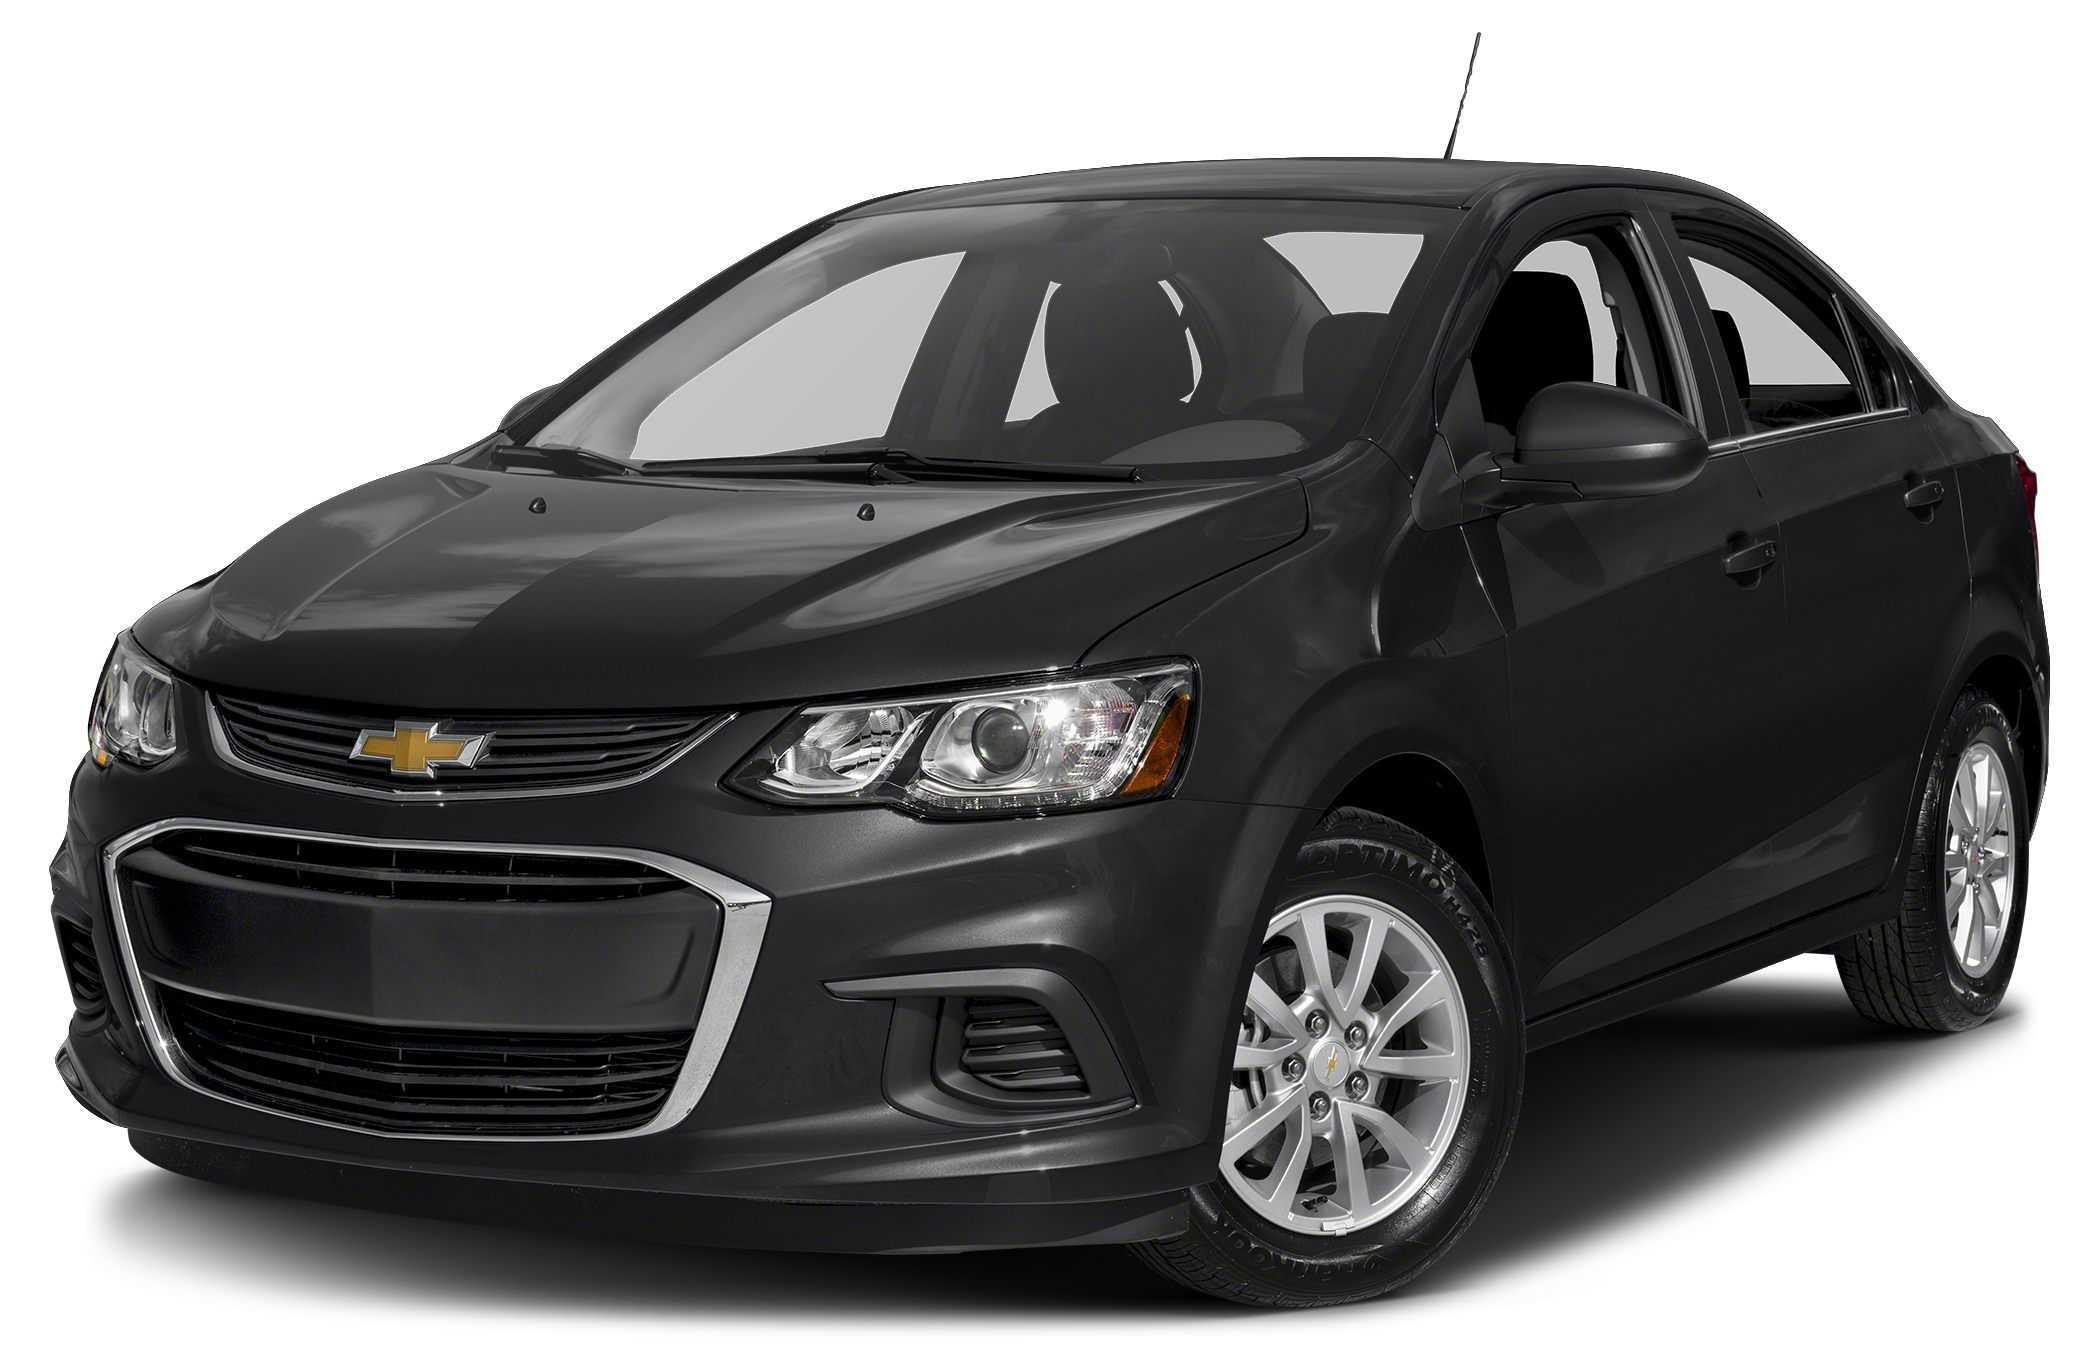 Charming Herrin Gear Used Cars U003eu003e 2017 CHEVROLET SONIC For Sale In Jackson, MS |